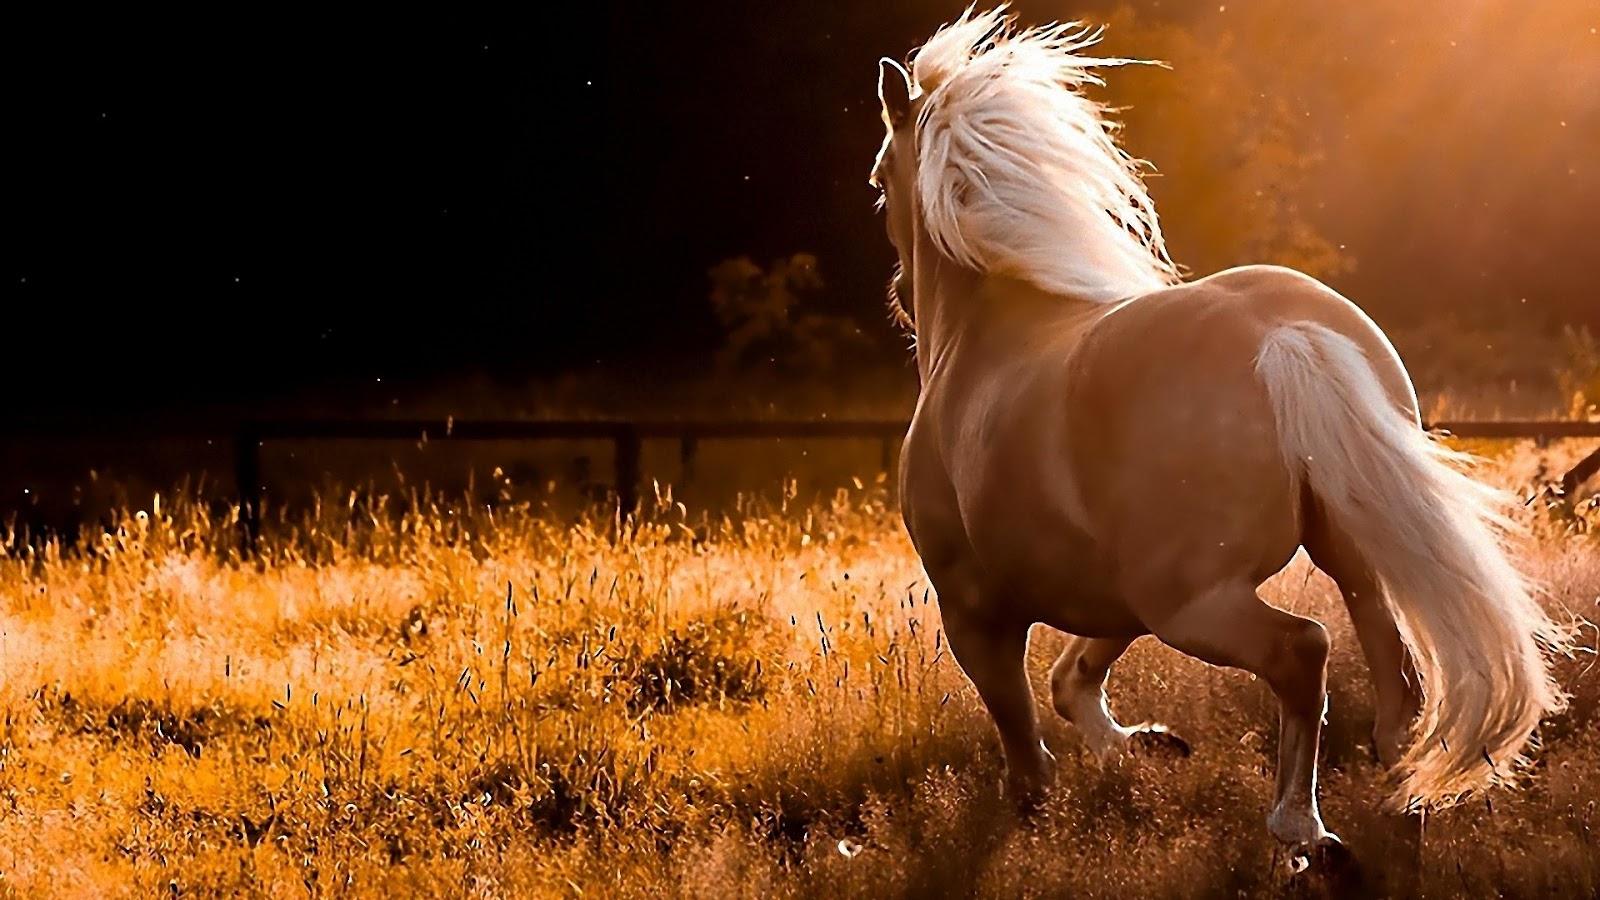 Beautiful Lovely Horse - Beautiful Lovely Horse